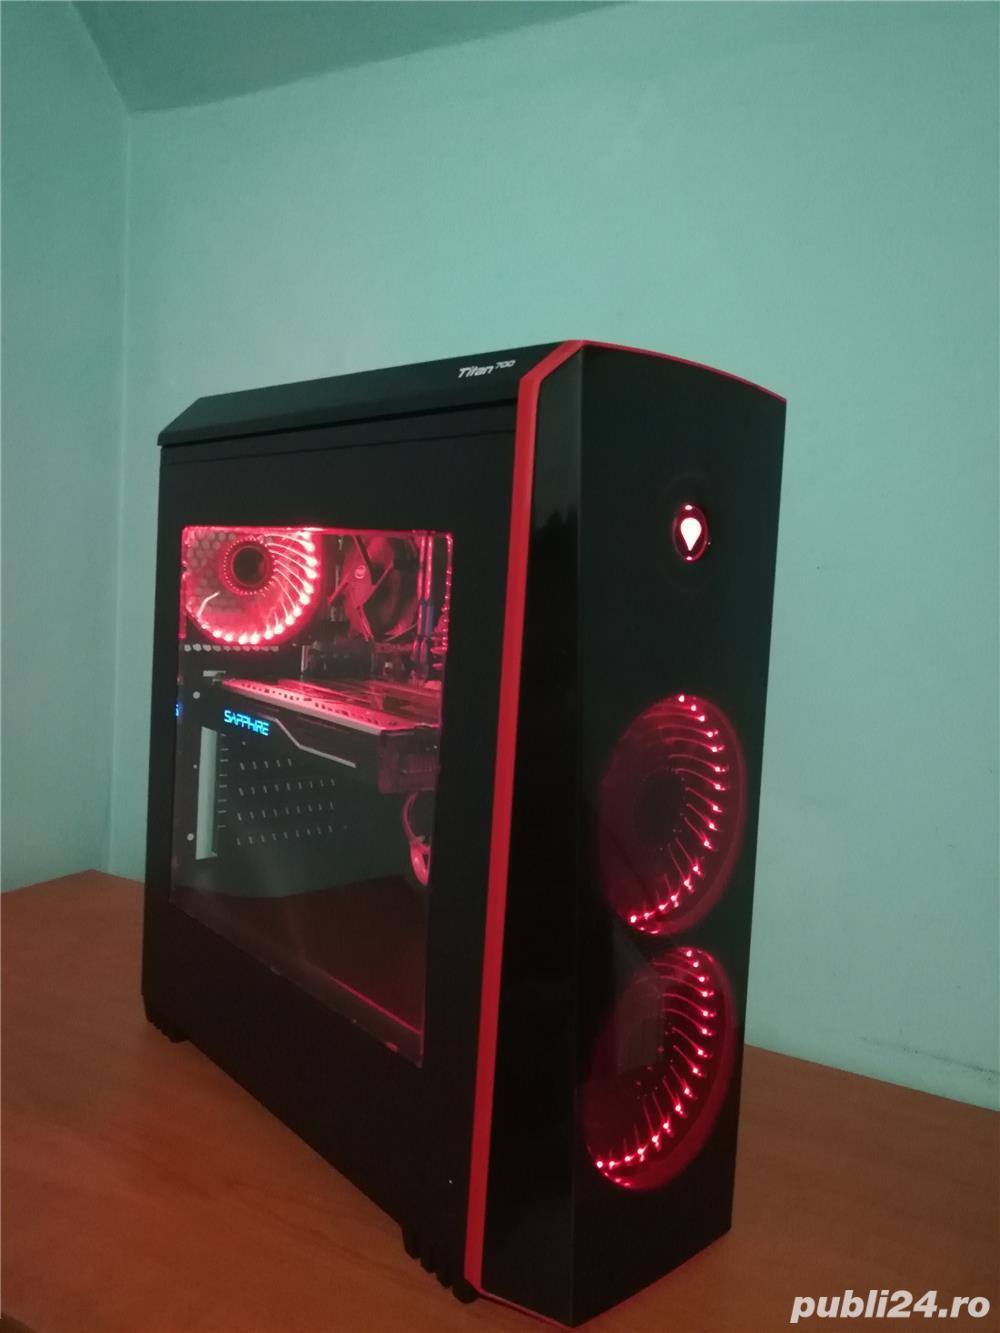 PC Gaming i5, RX 480, 12 GB RAM, SSD